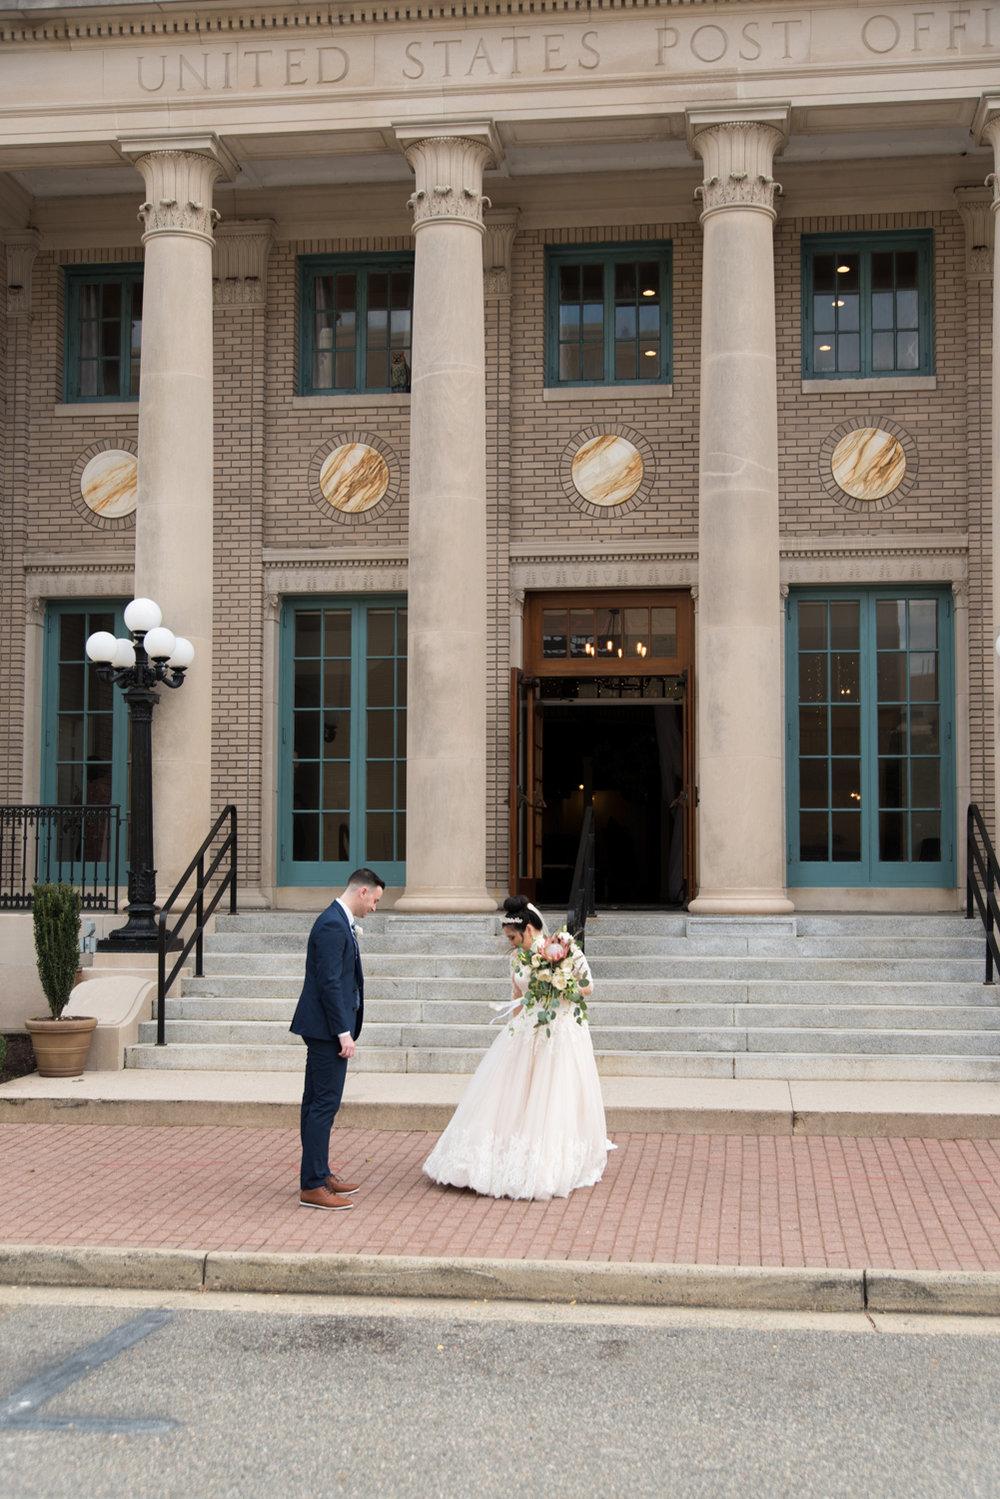 Rose Gold Wedding at Historic Post Office Virginia Harry Potter Themed Wedding-133.JPG